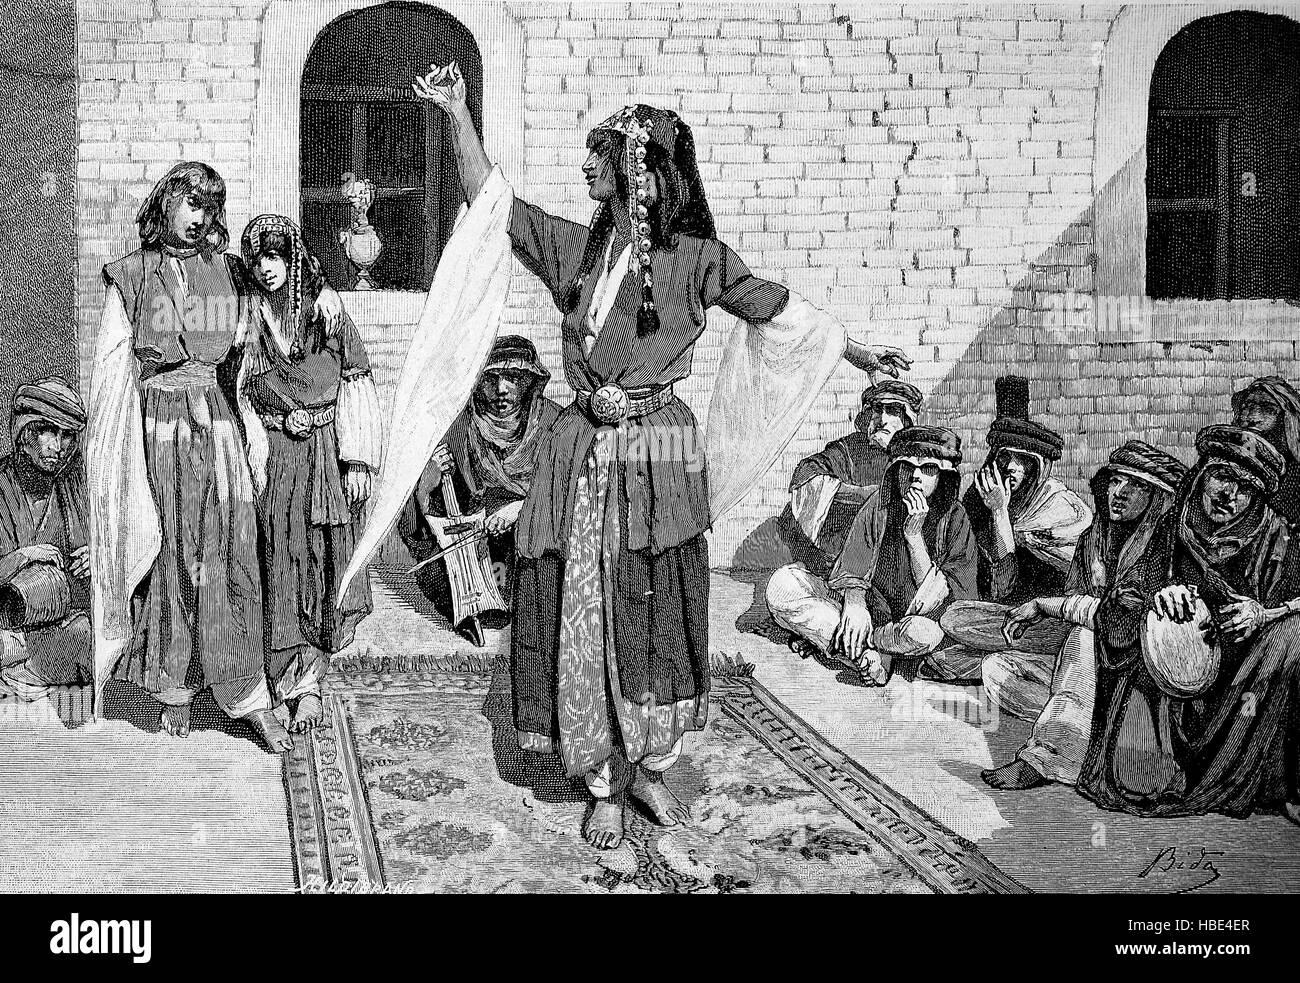 arabian dancer, Arabia, illustration, woodcut from 1880 - Stock Image